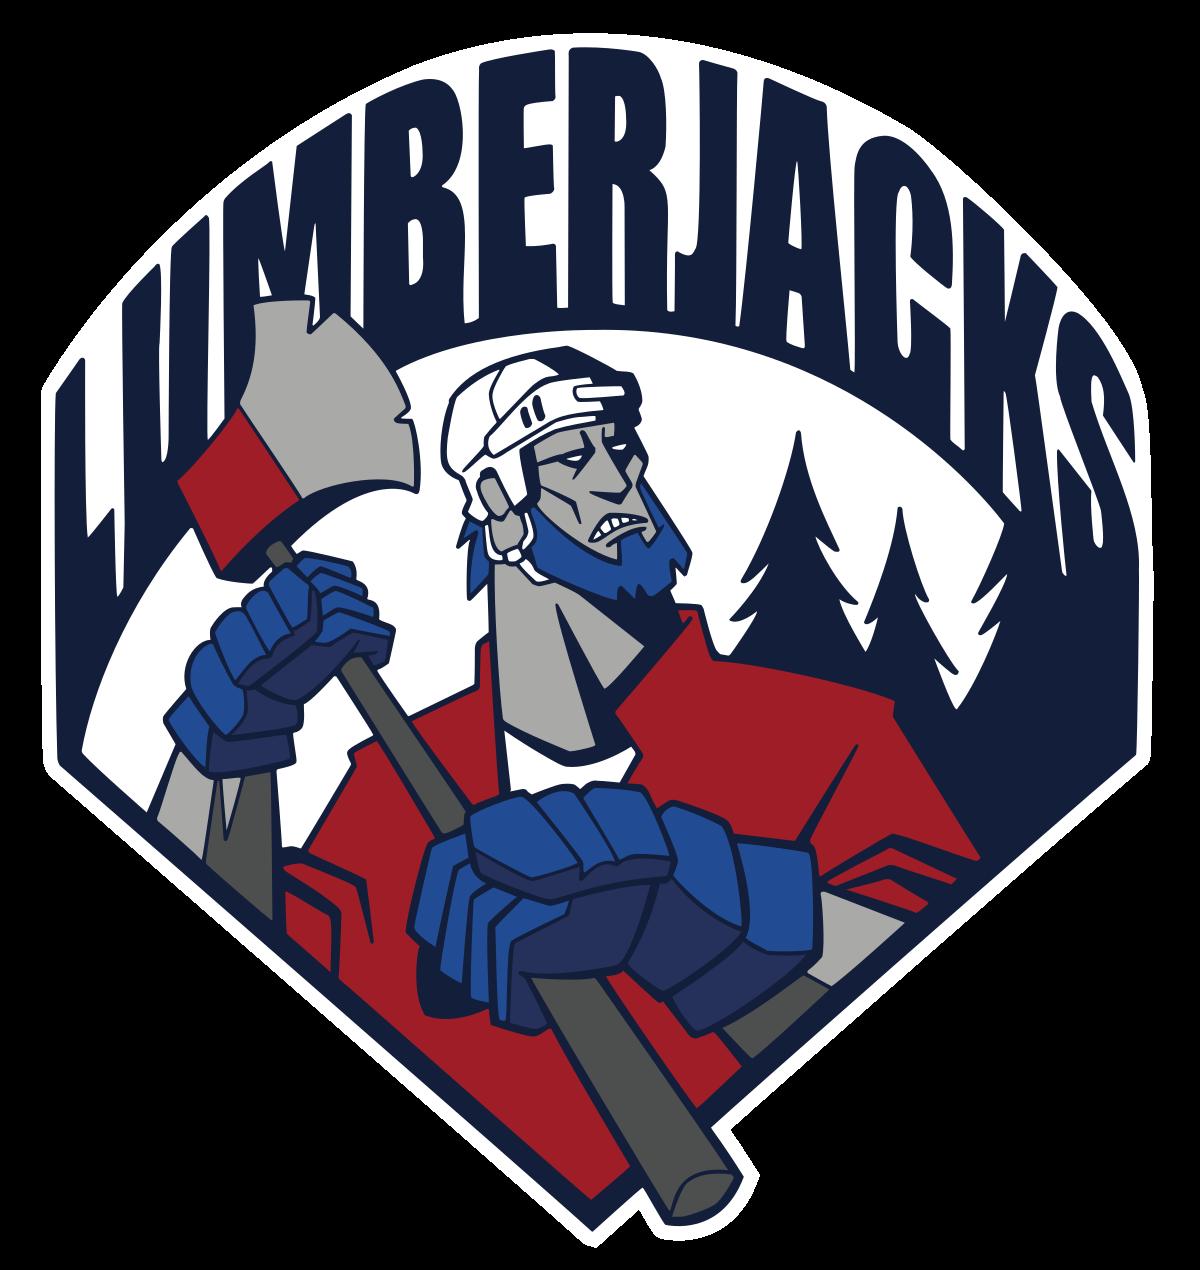 jpg royalty free South shore lumberjacks wikipedia. Lumberjack clipart svg.